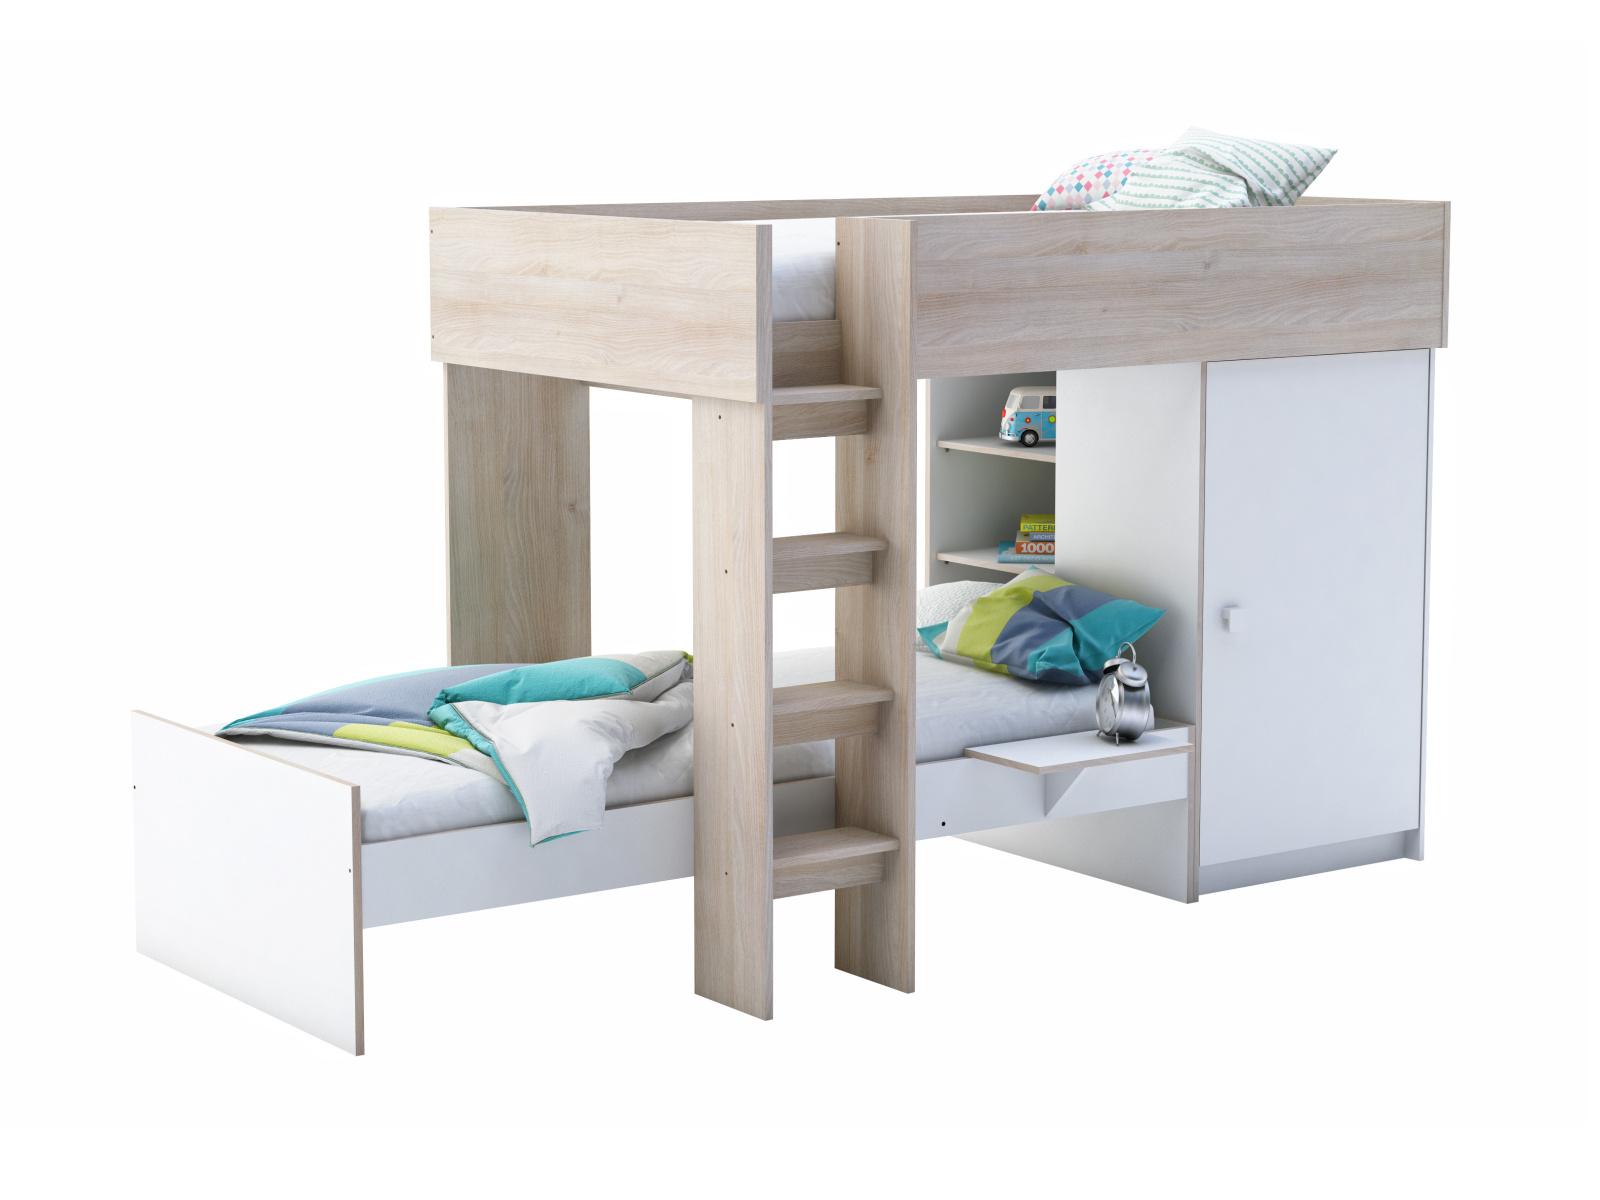 DEMEYERE TRANO patrová postel 90x200 cm, akát/bílá